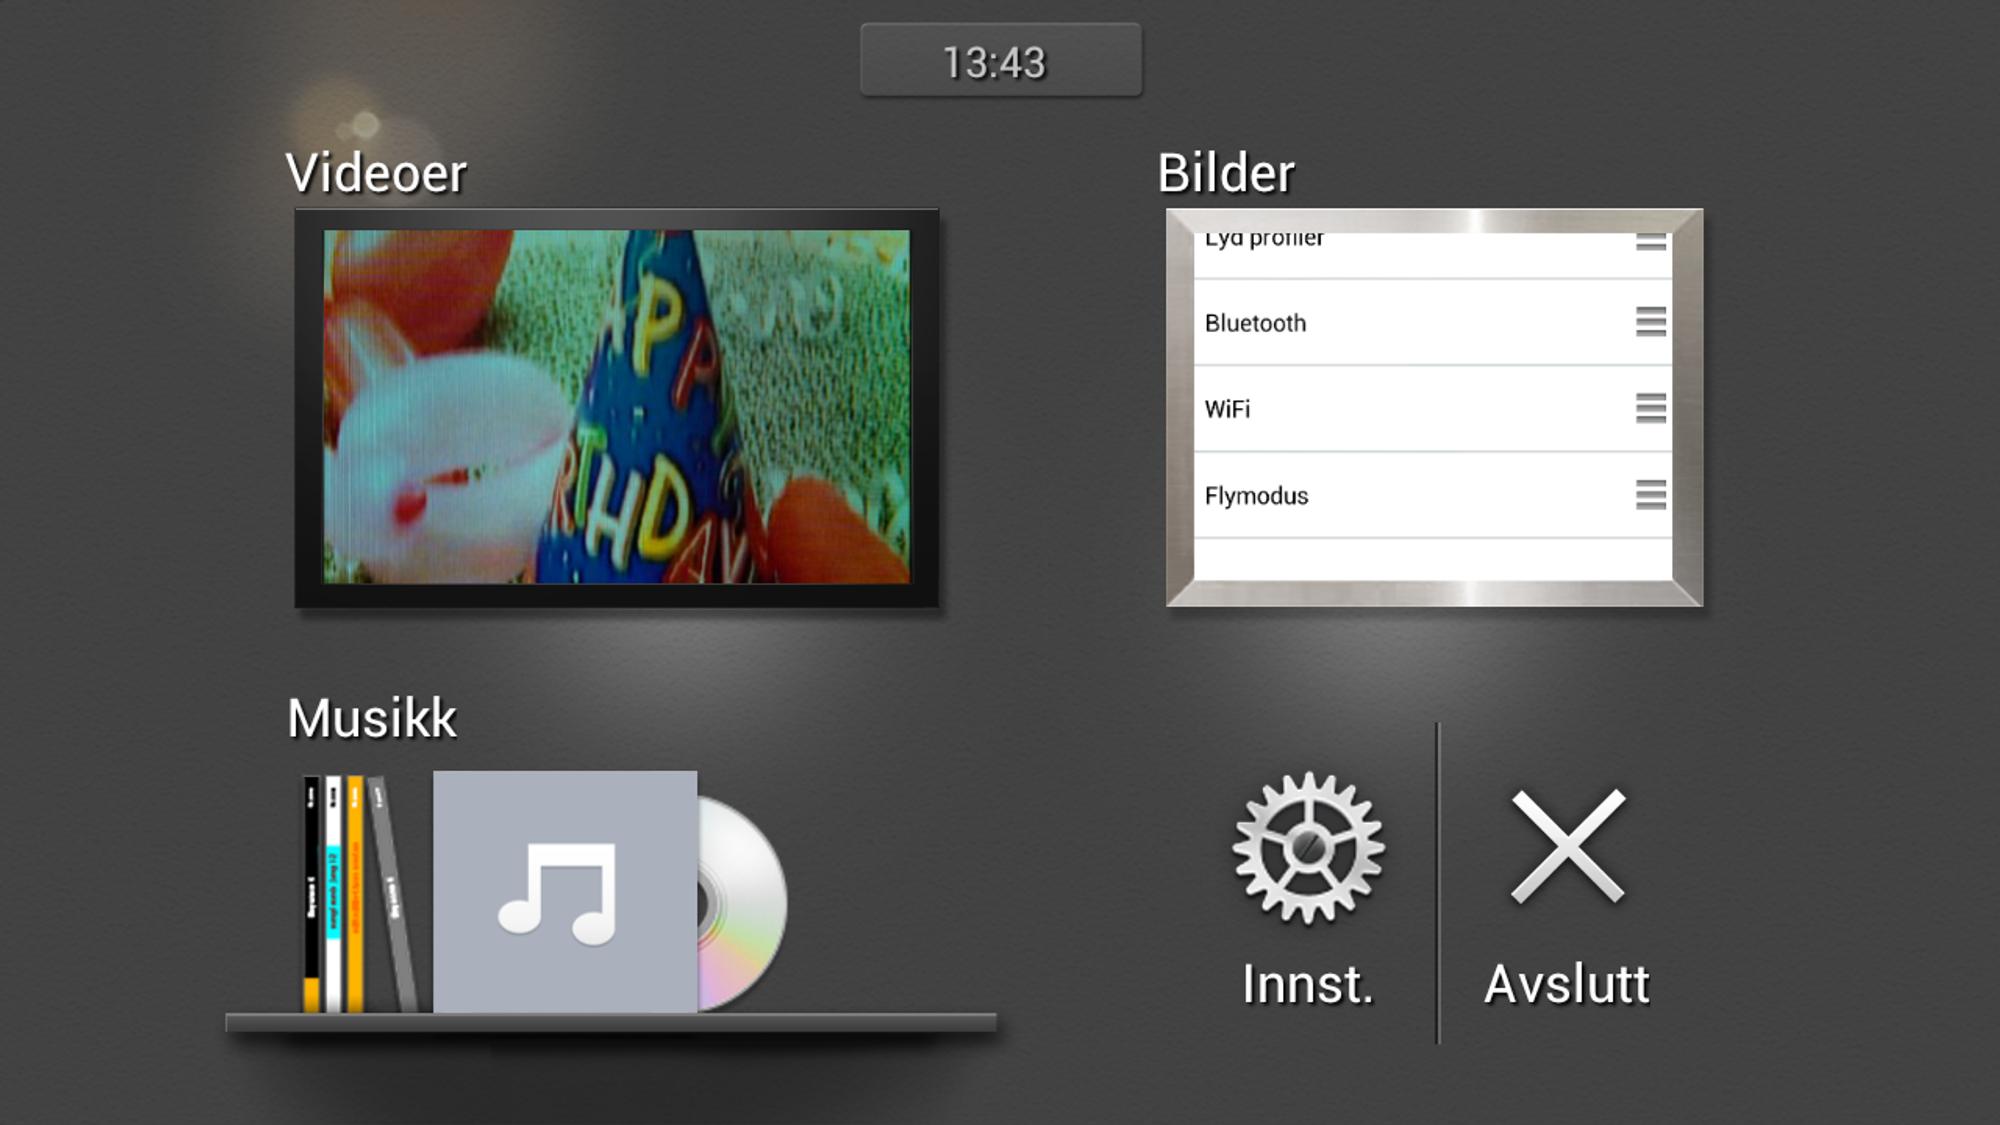 TEST: LG Optimus 4X HD P880 - Multimedia